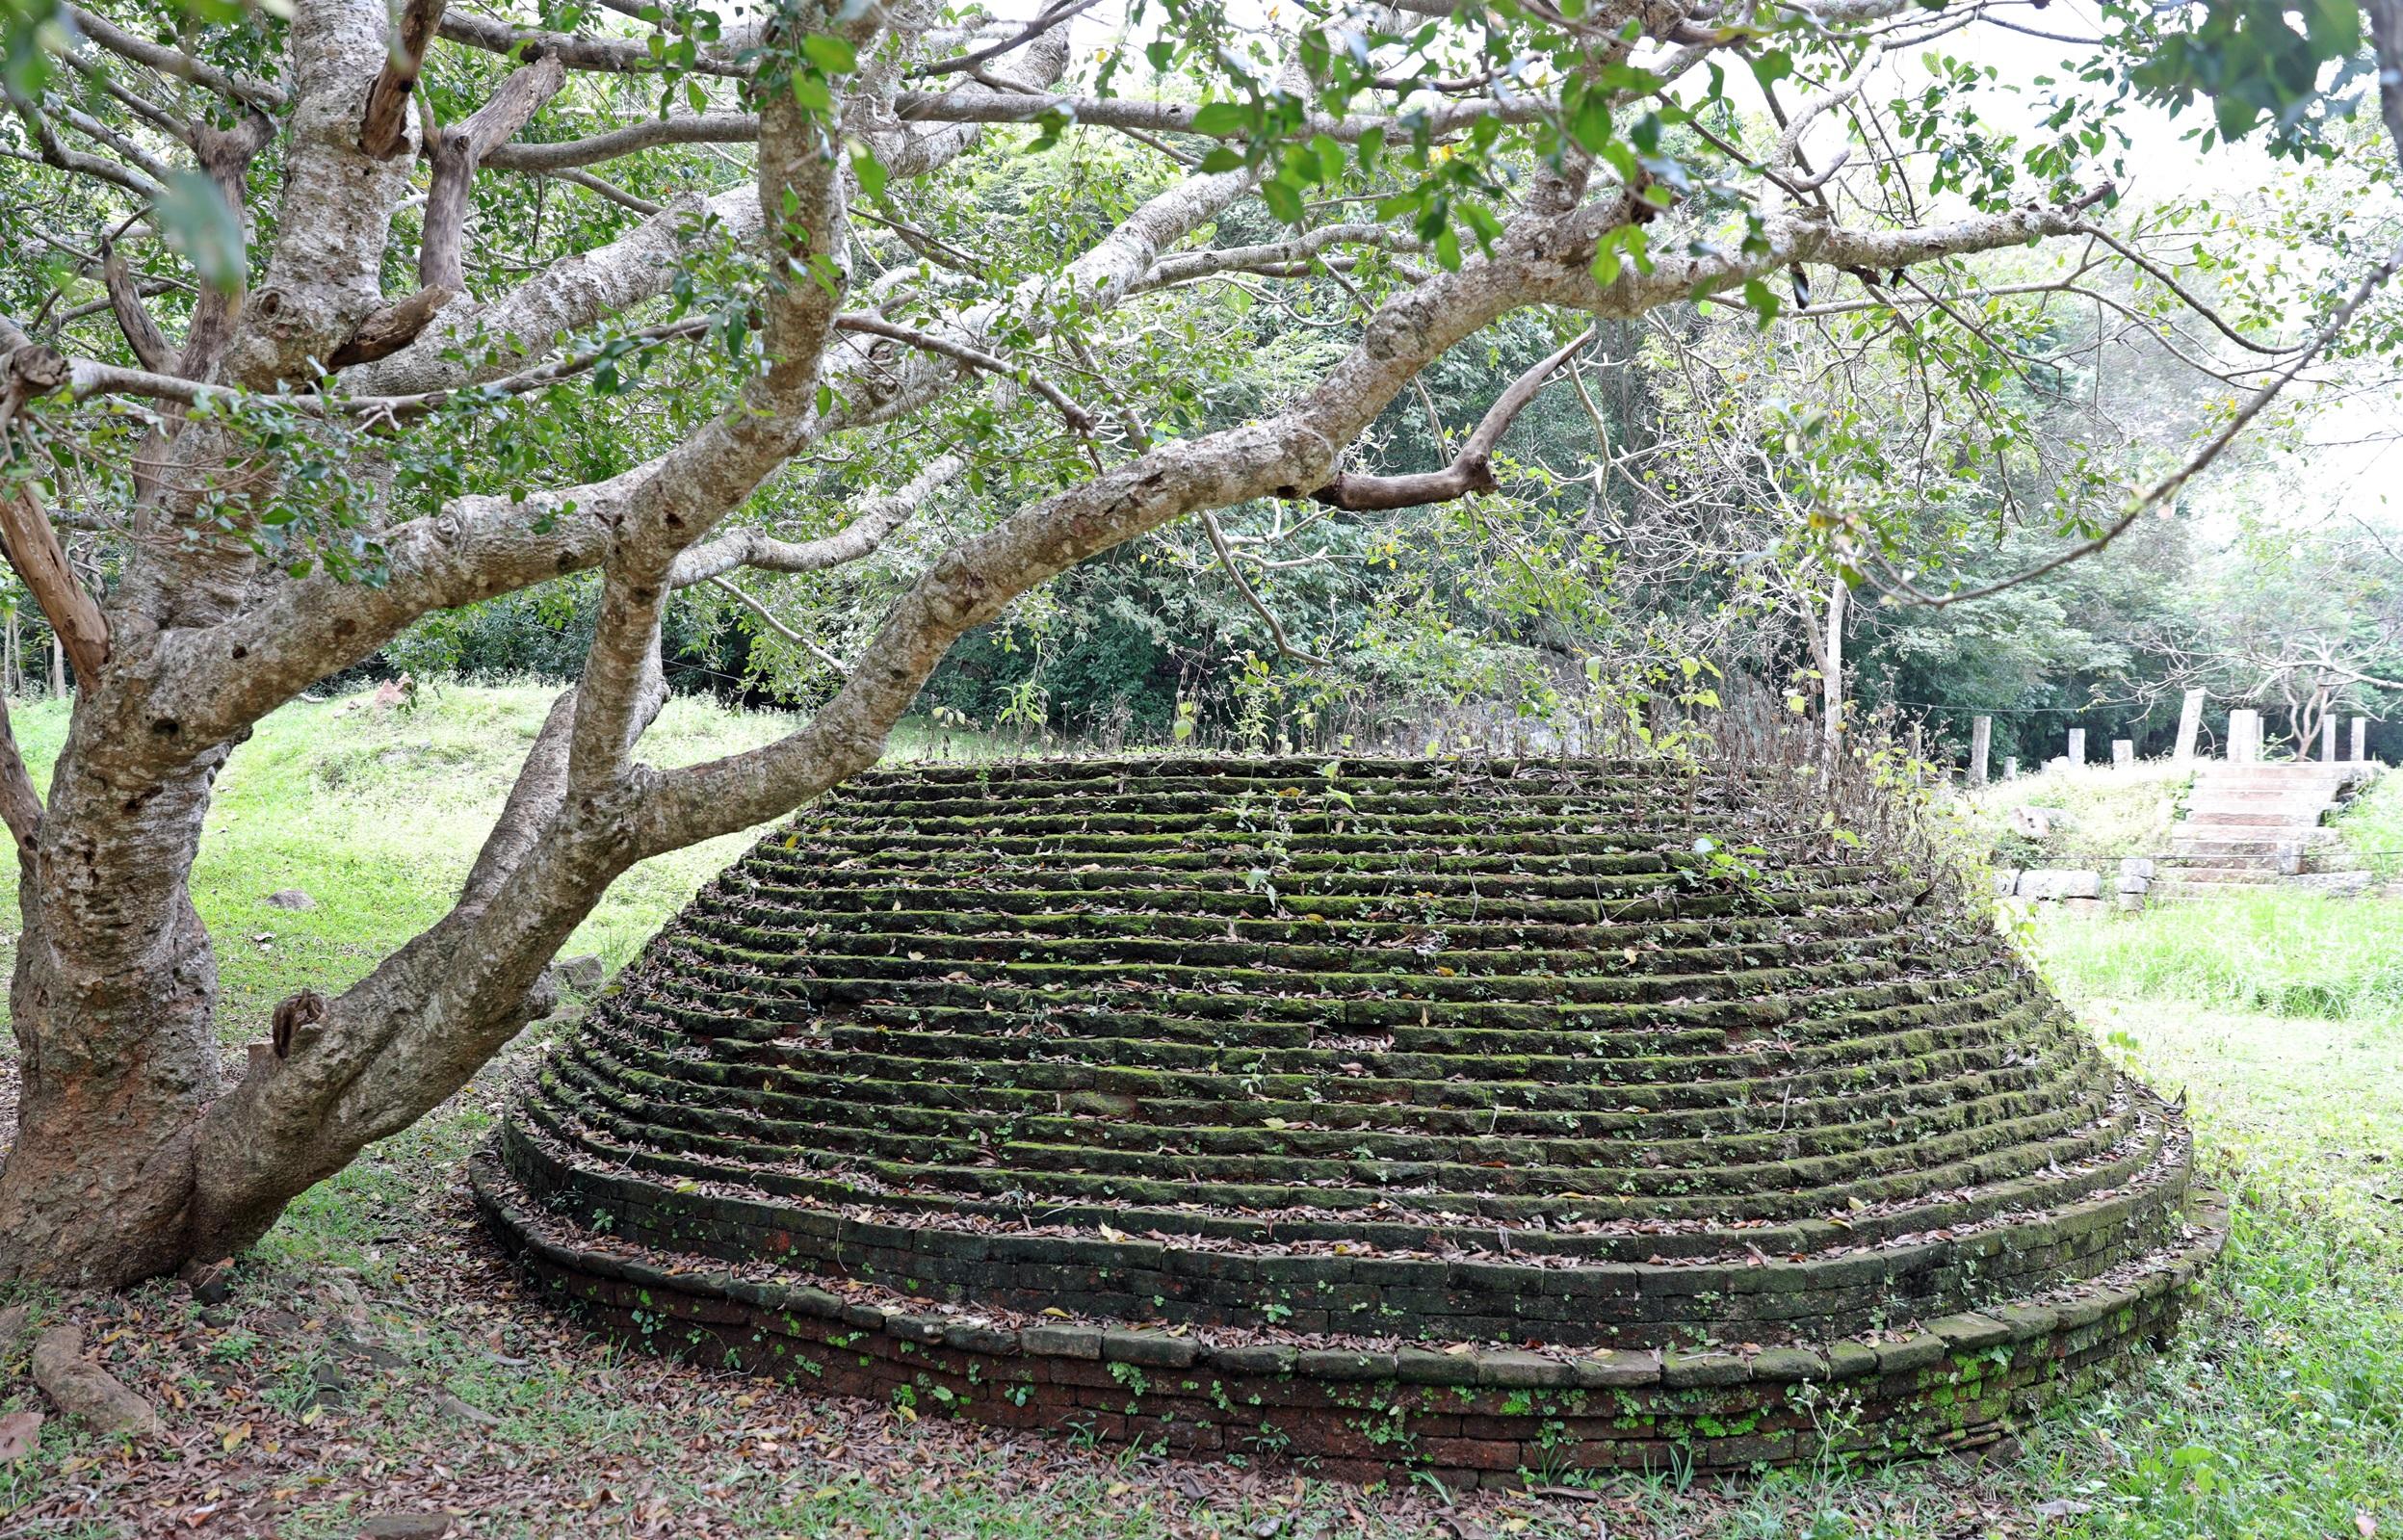 Stupa ruin in monastery, Mihintale